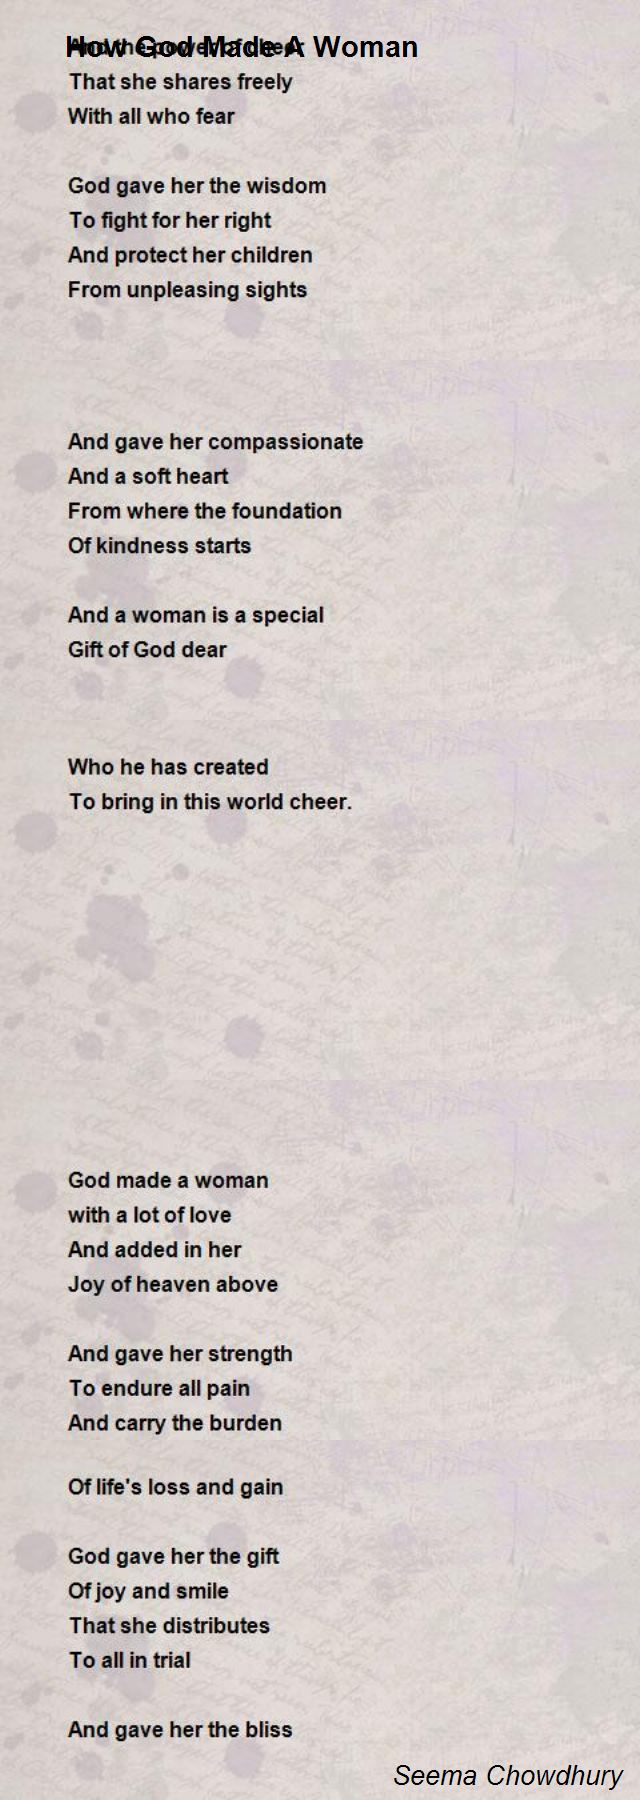 How God Made A Woman Poem By Seema Chowdhury Poem Hunter